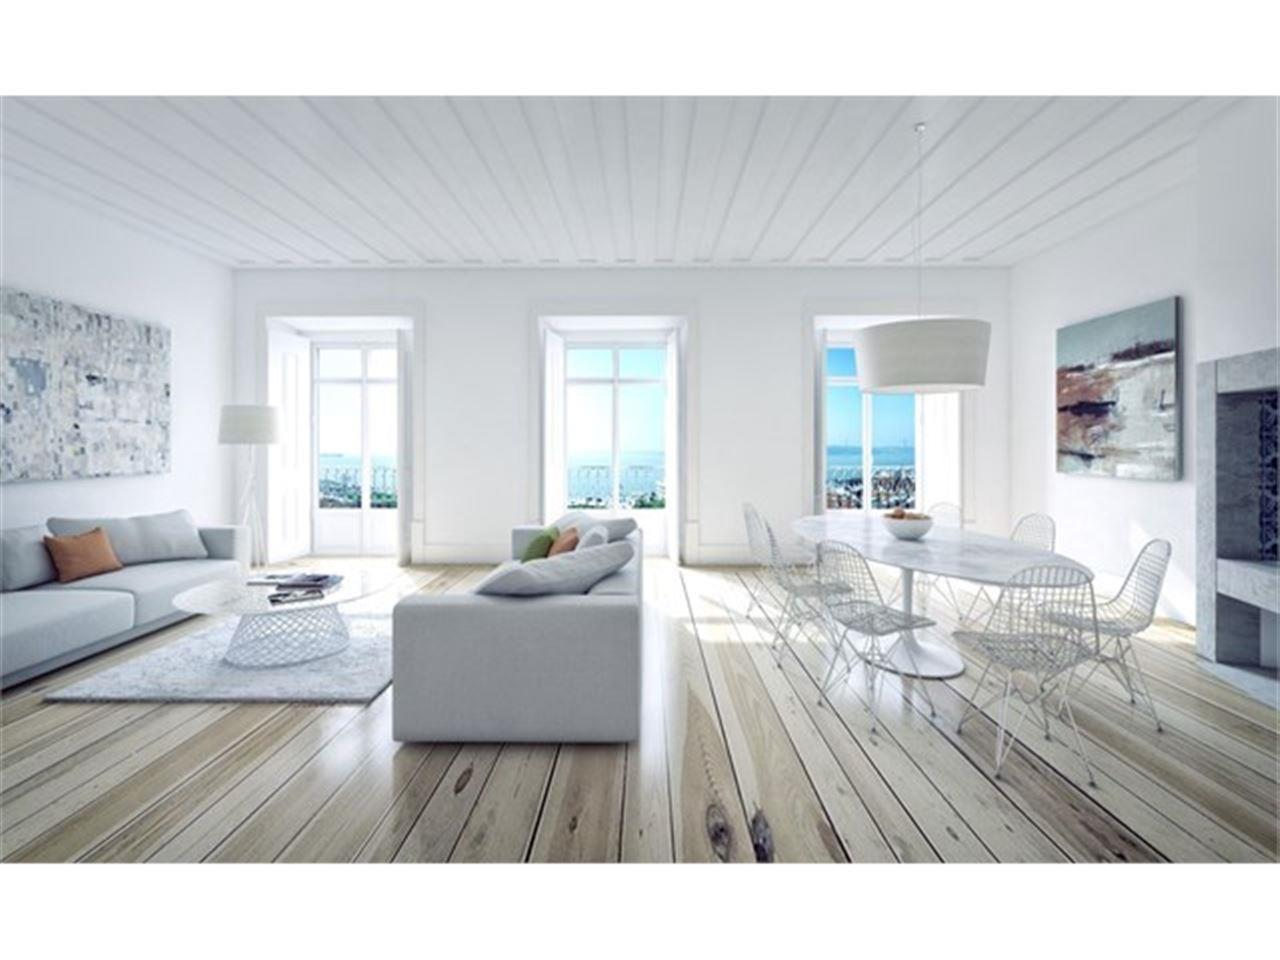 Apartment for Sale at Flat, 3 bedrooms, for Sale Chiado, Lisboa, Lisboa Portugal